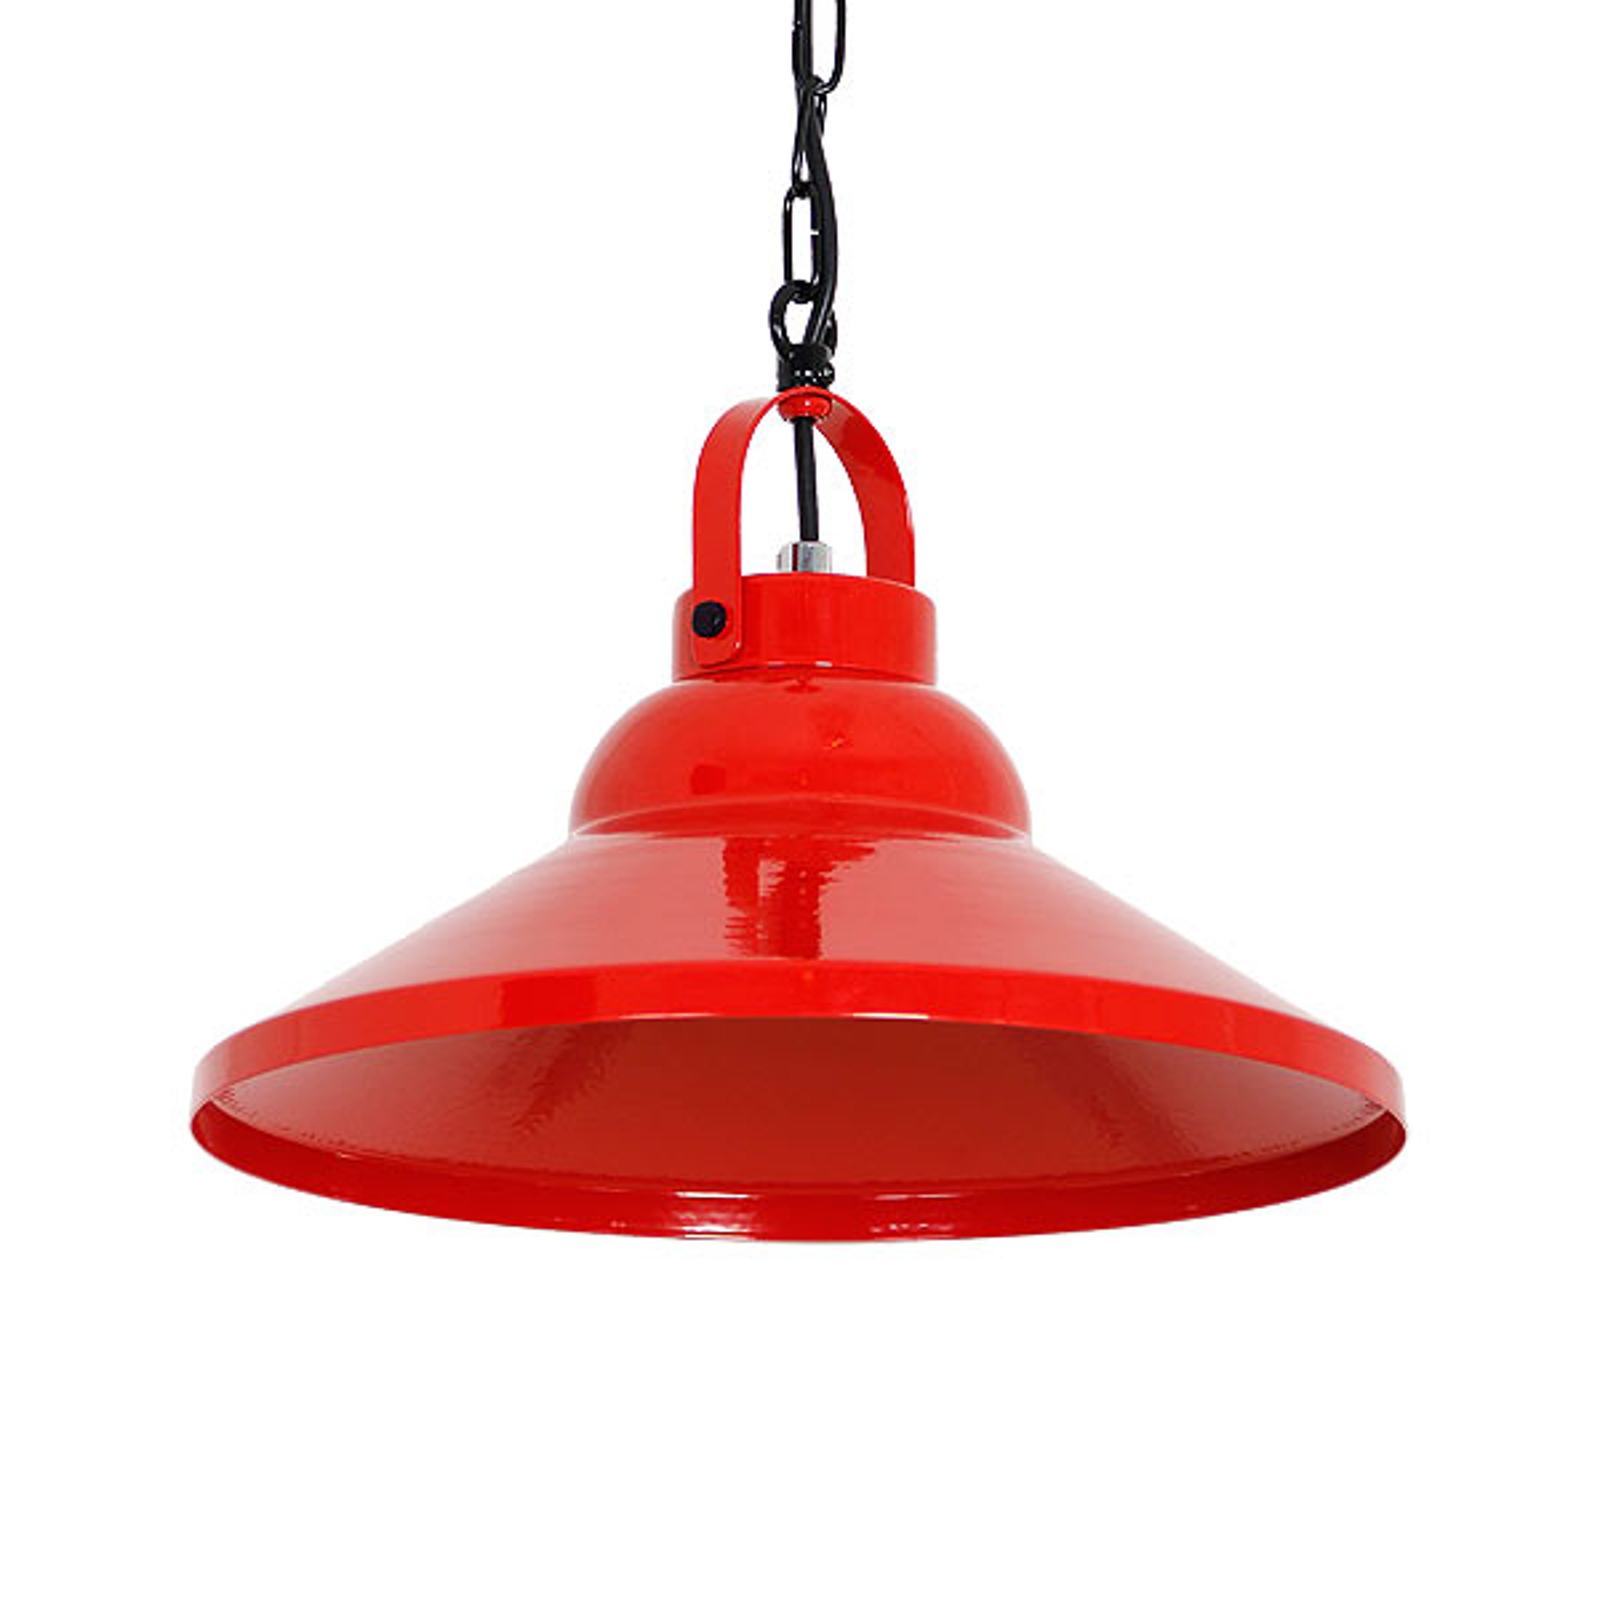 Hanglamp Iron, rood